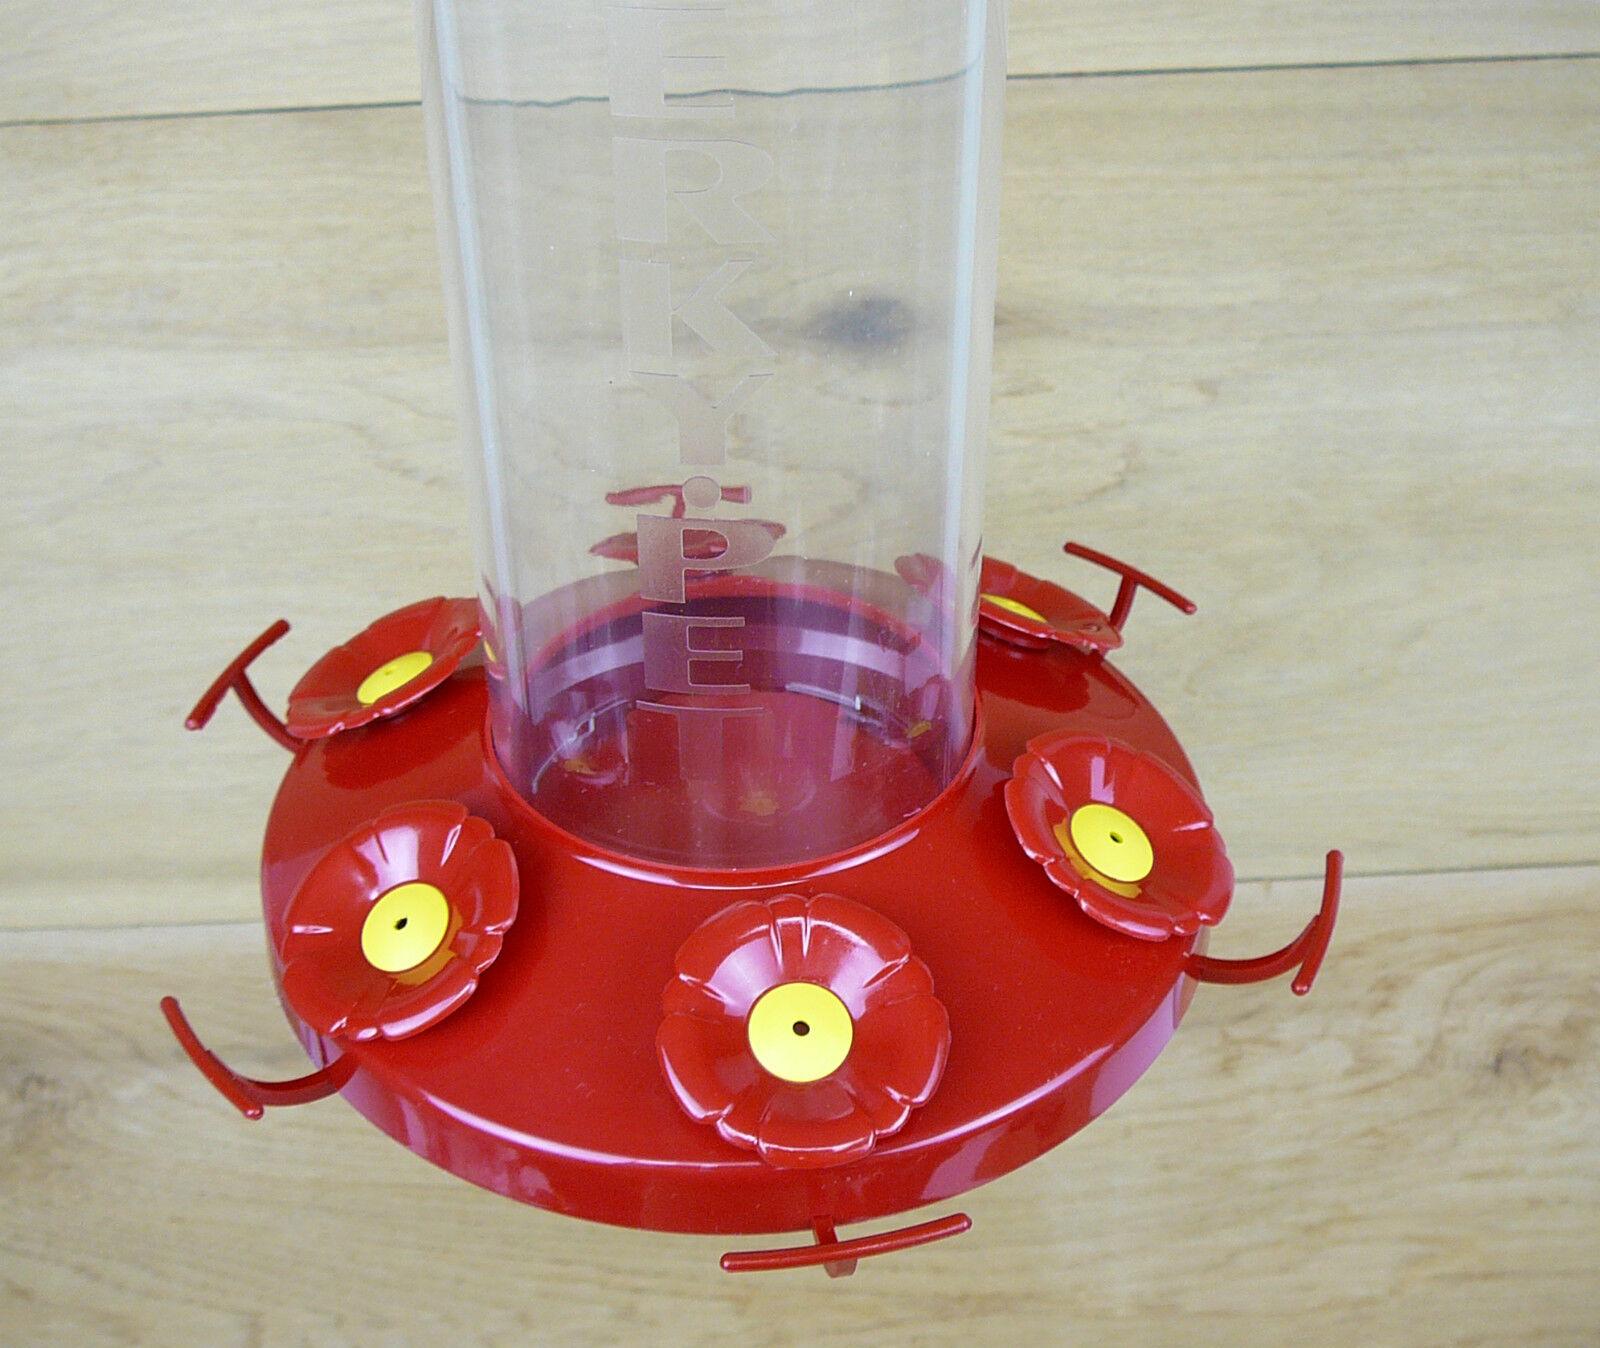 Perky Pet Grand Master 48oz Hummingbird Feeder 6 Feeding Ports w// Perches #220